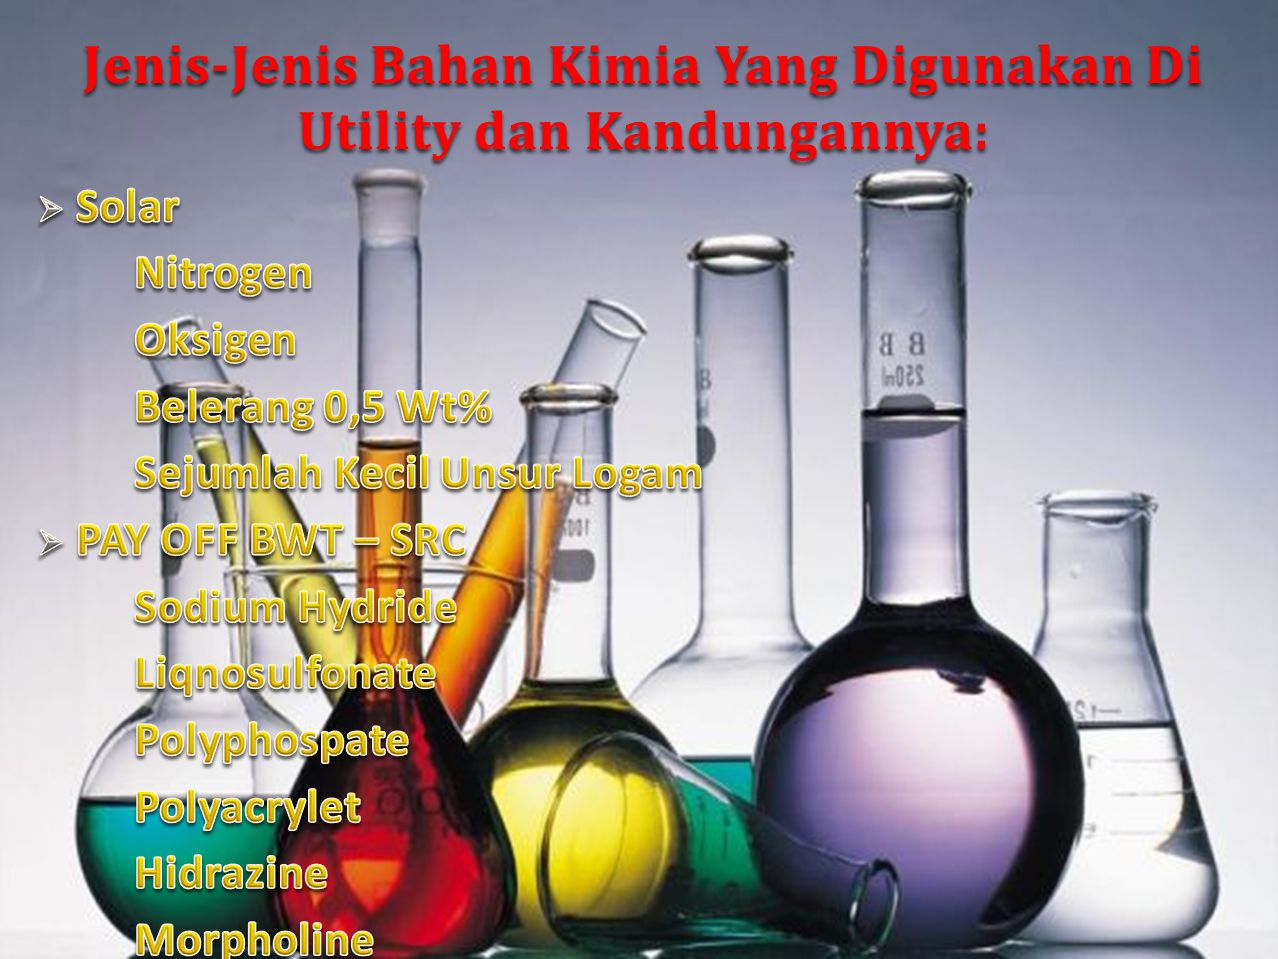 Jenis-Jenis Bahan Kimia Yang Digunakan Di Utility dan Kandungannya: